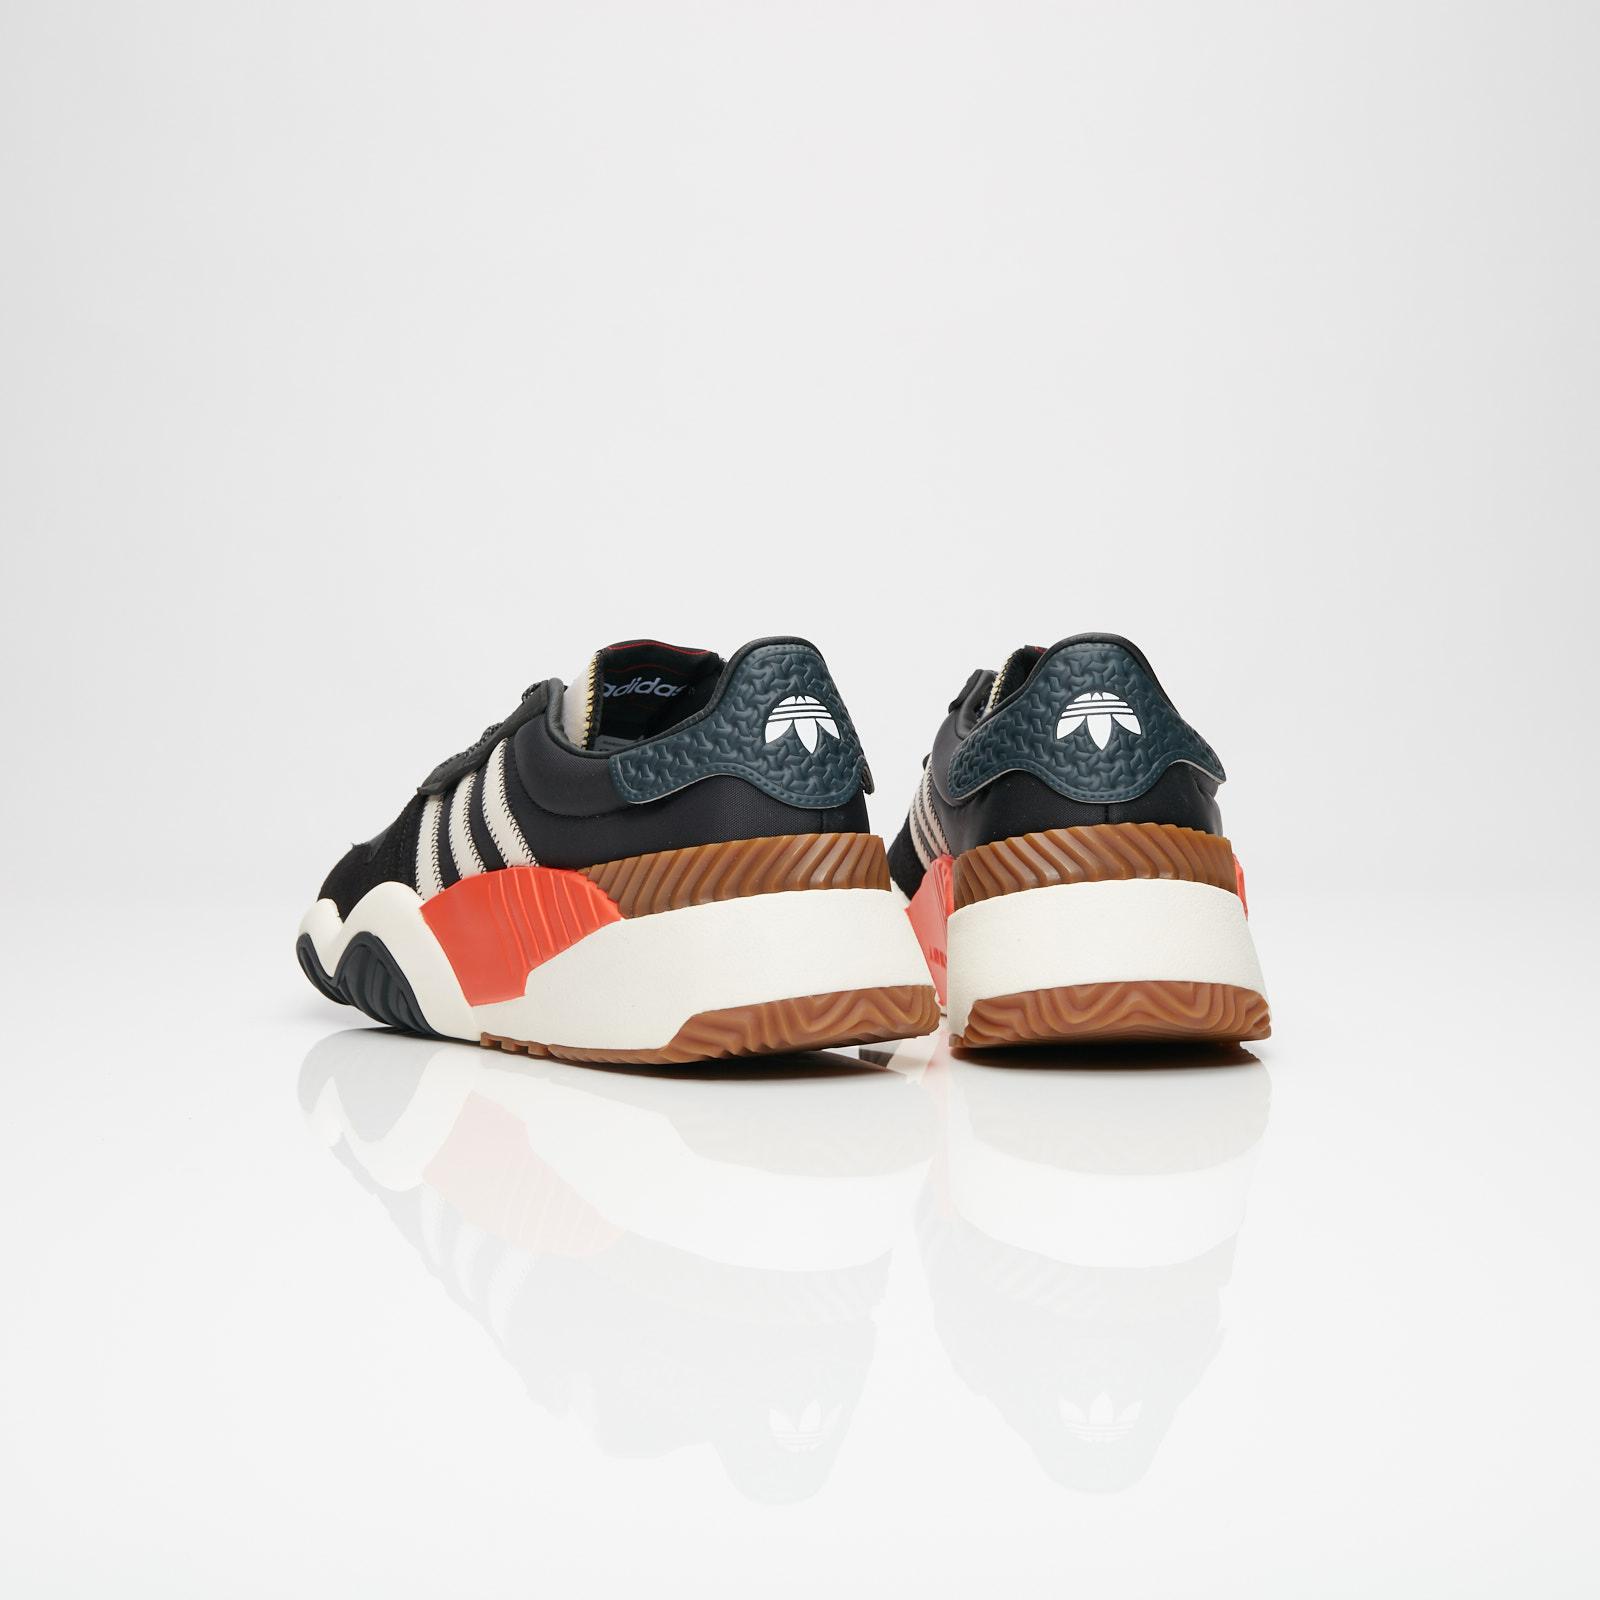 ... adidas Originals by Alexander Wang Trainer x Alexander Wang ... bd390f315